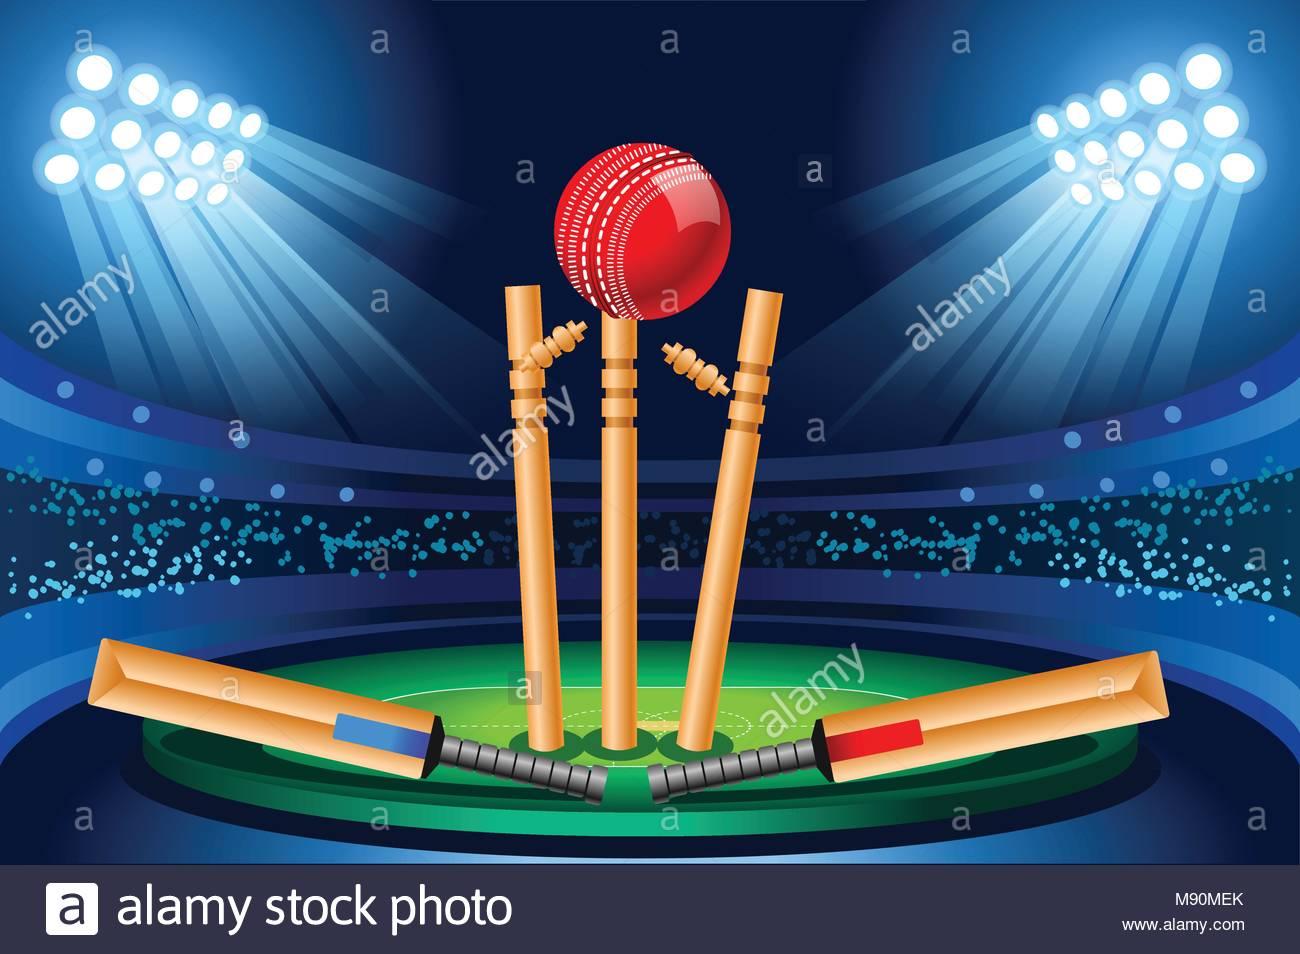 3d Wallpaper Indian Cricket Team Cricket Stadium Background Hitting Recreation Equipment